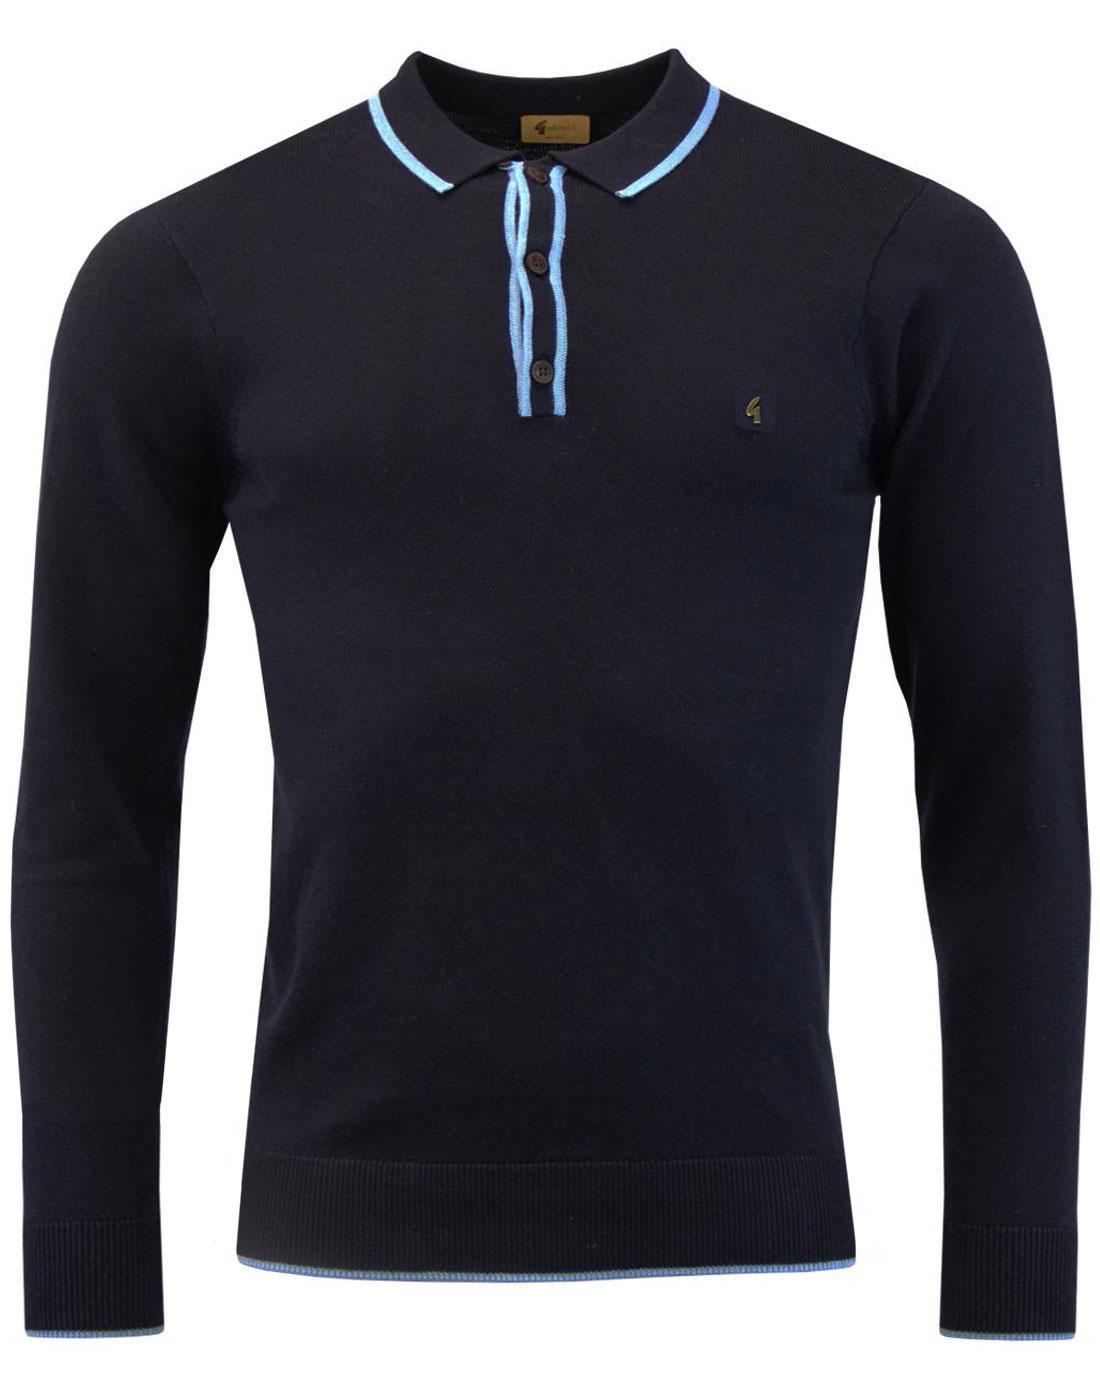 Lineker GABICCI VINTAGE Mod Tipped Knit Polo Shirt